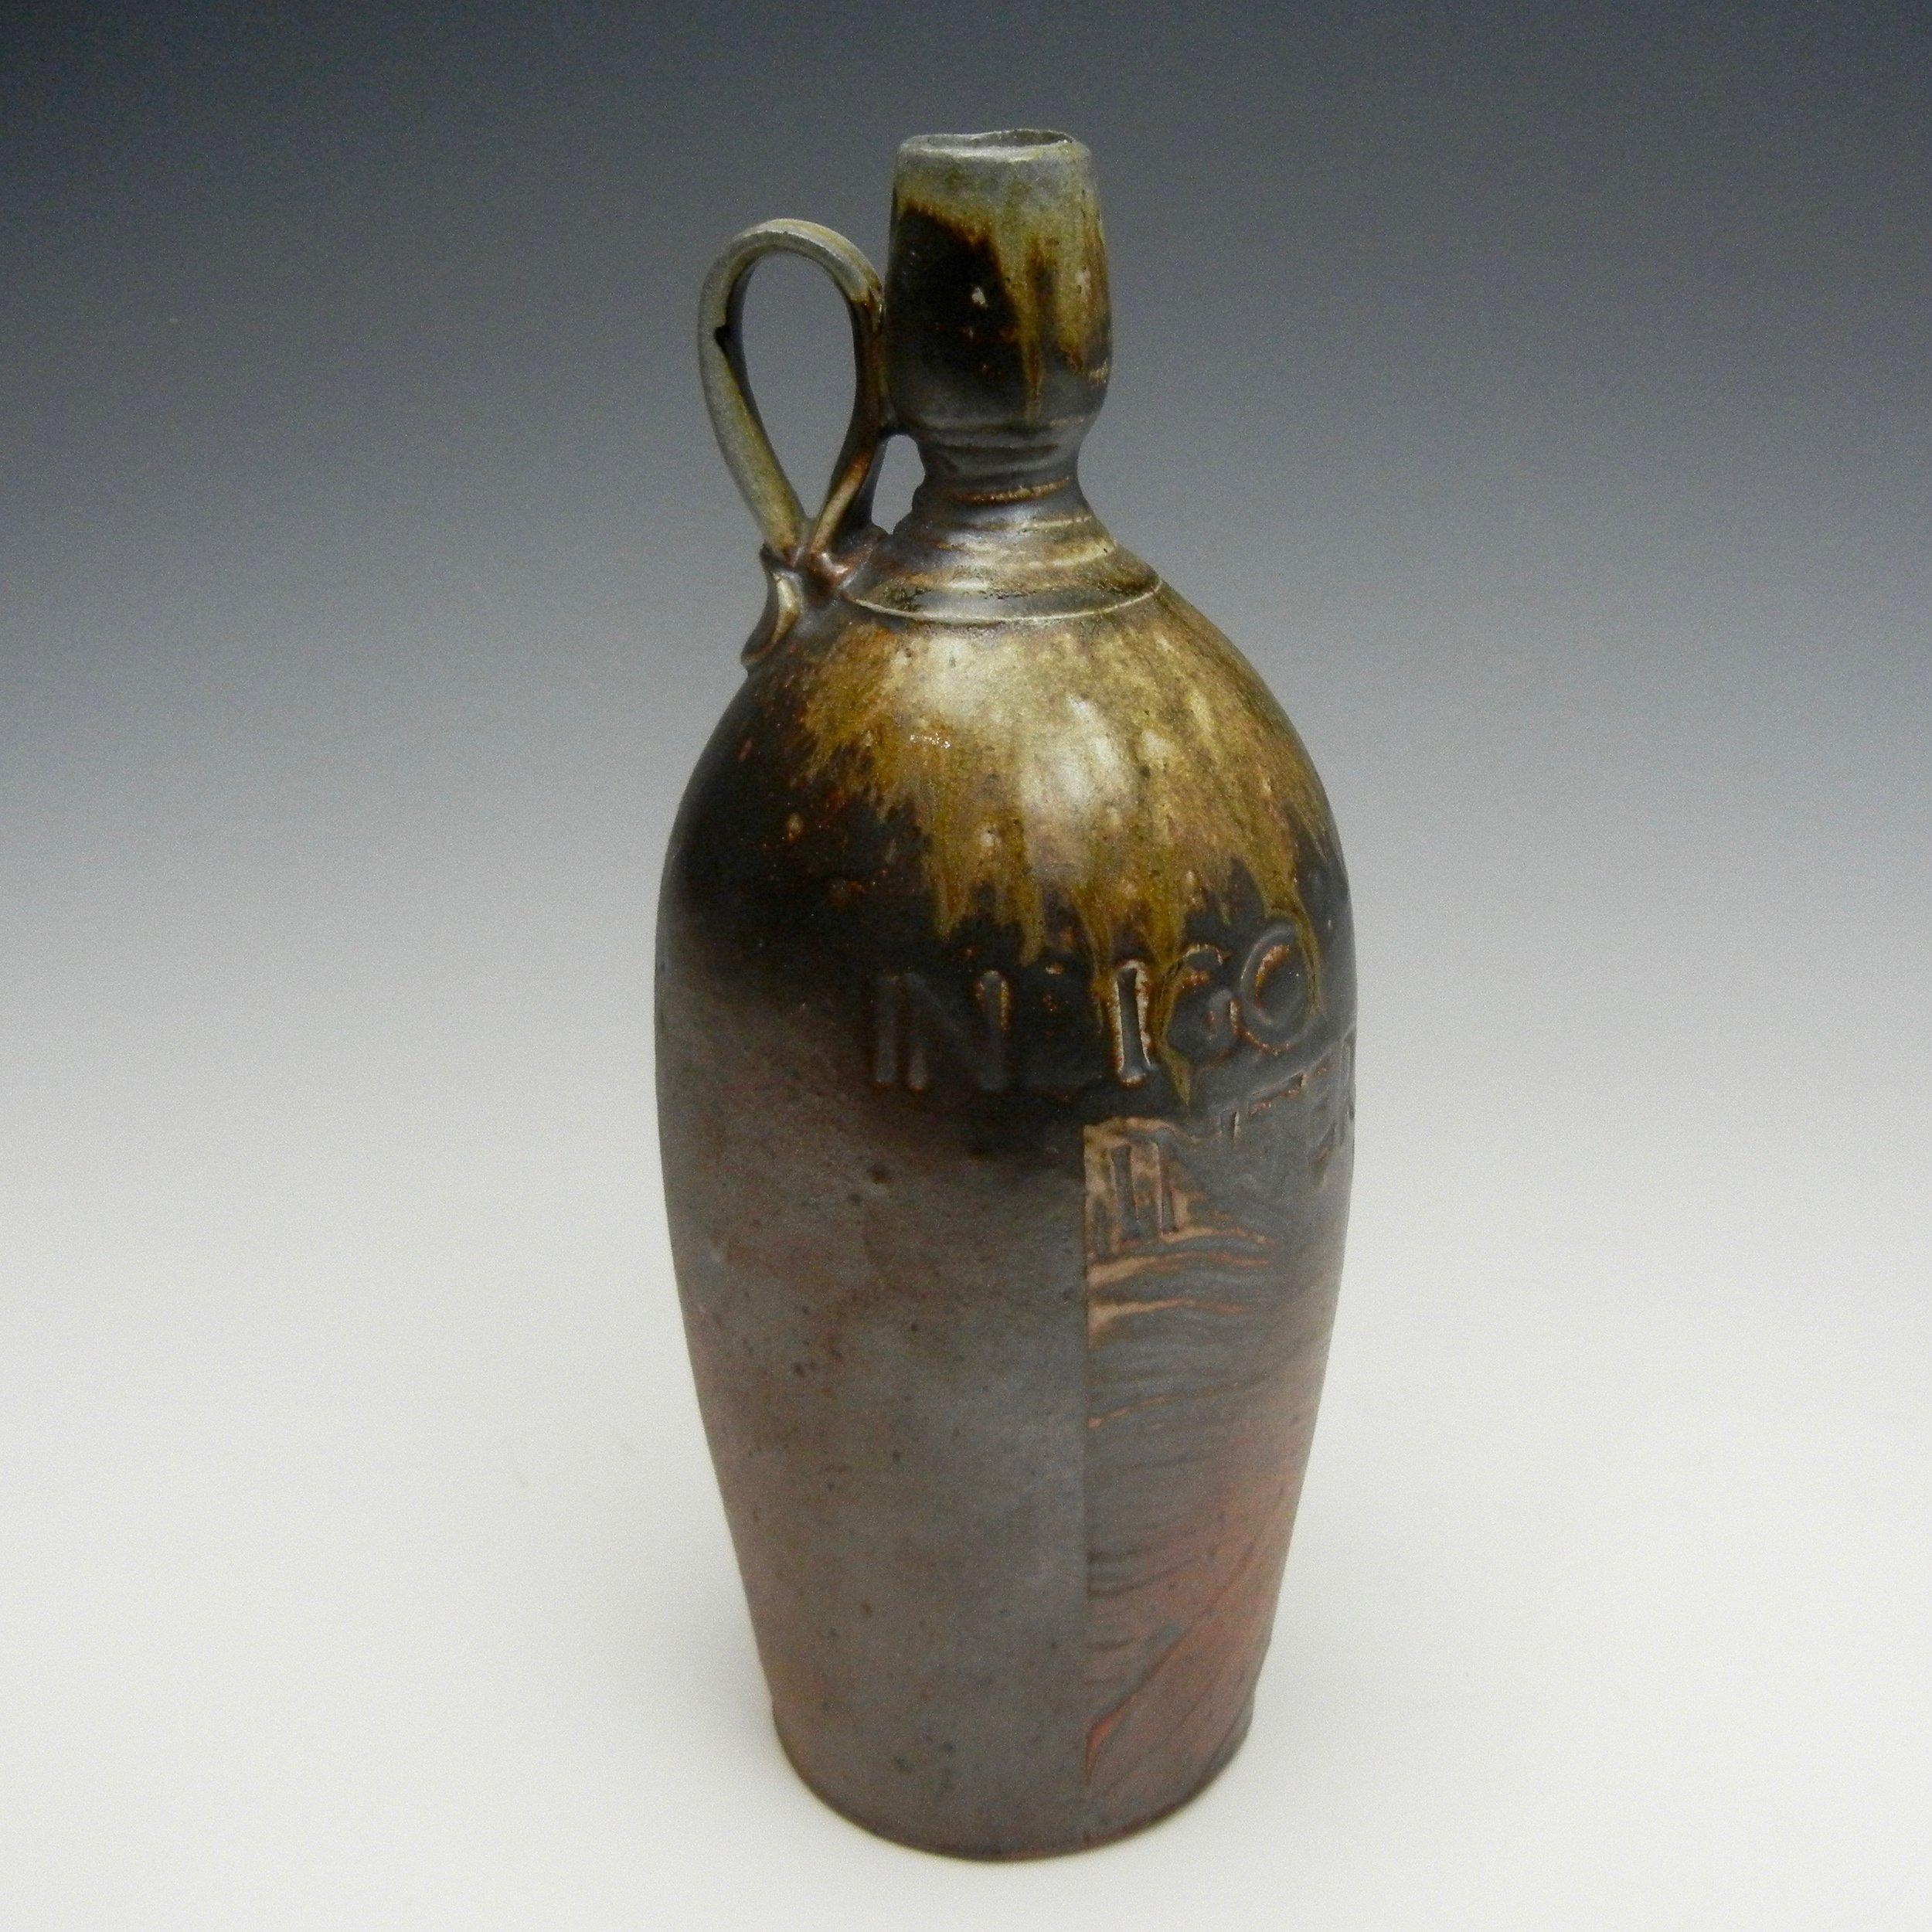 Lorenz Pottery, handmade, ceramics, pottery, folk pottery, wood fired, soda fired, jug, bottle